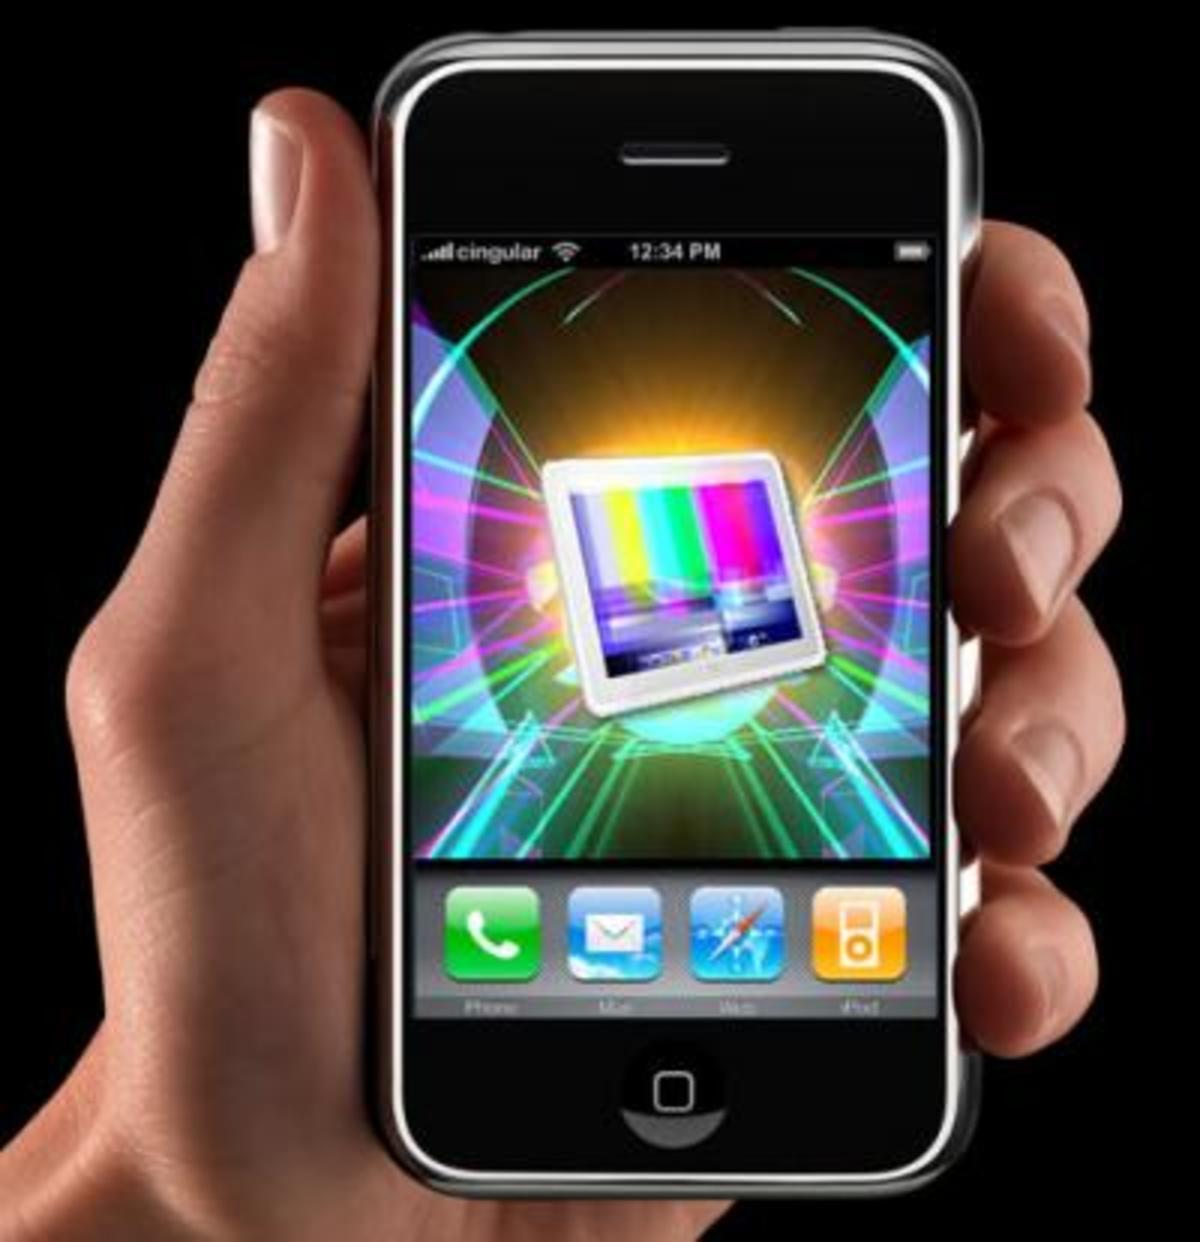 iPhone 3GS σε ρόλο παιχνιδομηχανής | Newsit.gr